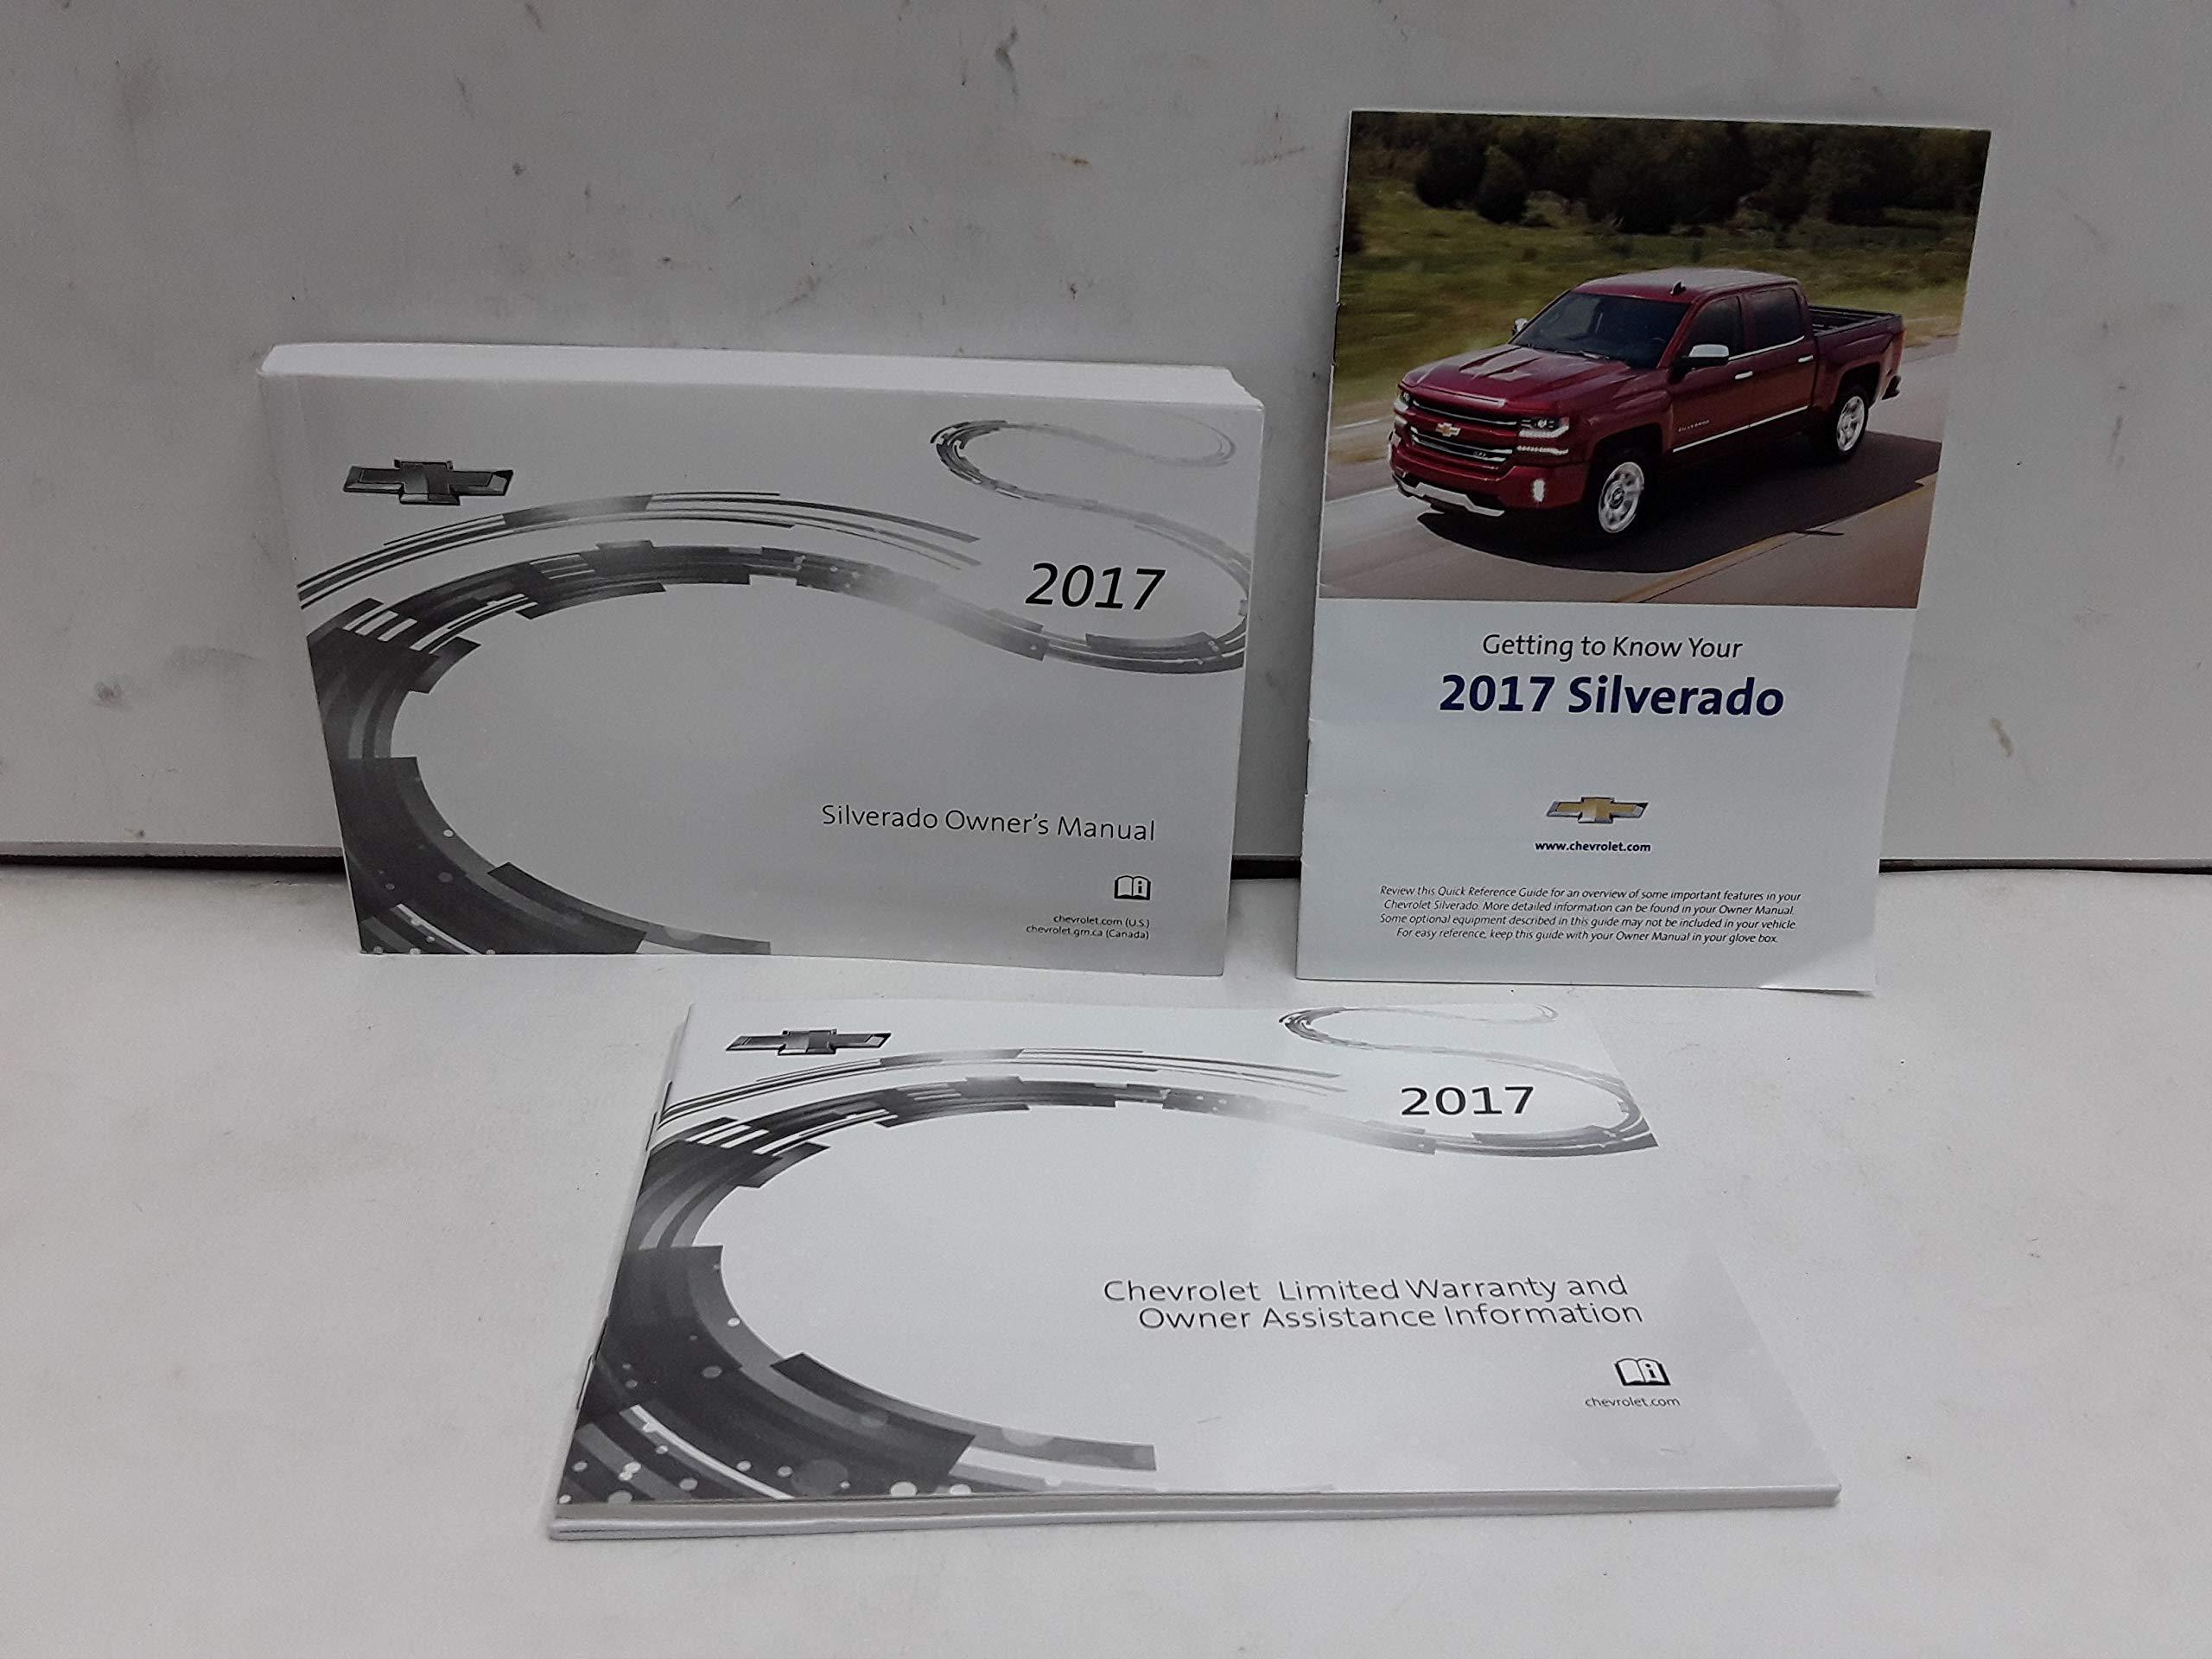 Motors Vehicle Parts & Accessories 2017 Chevy Silverado Owners ...